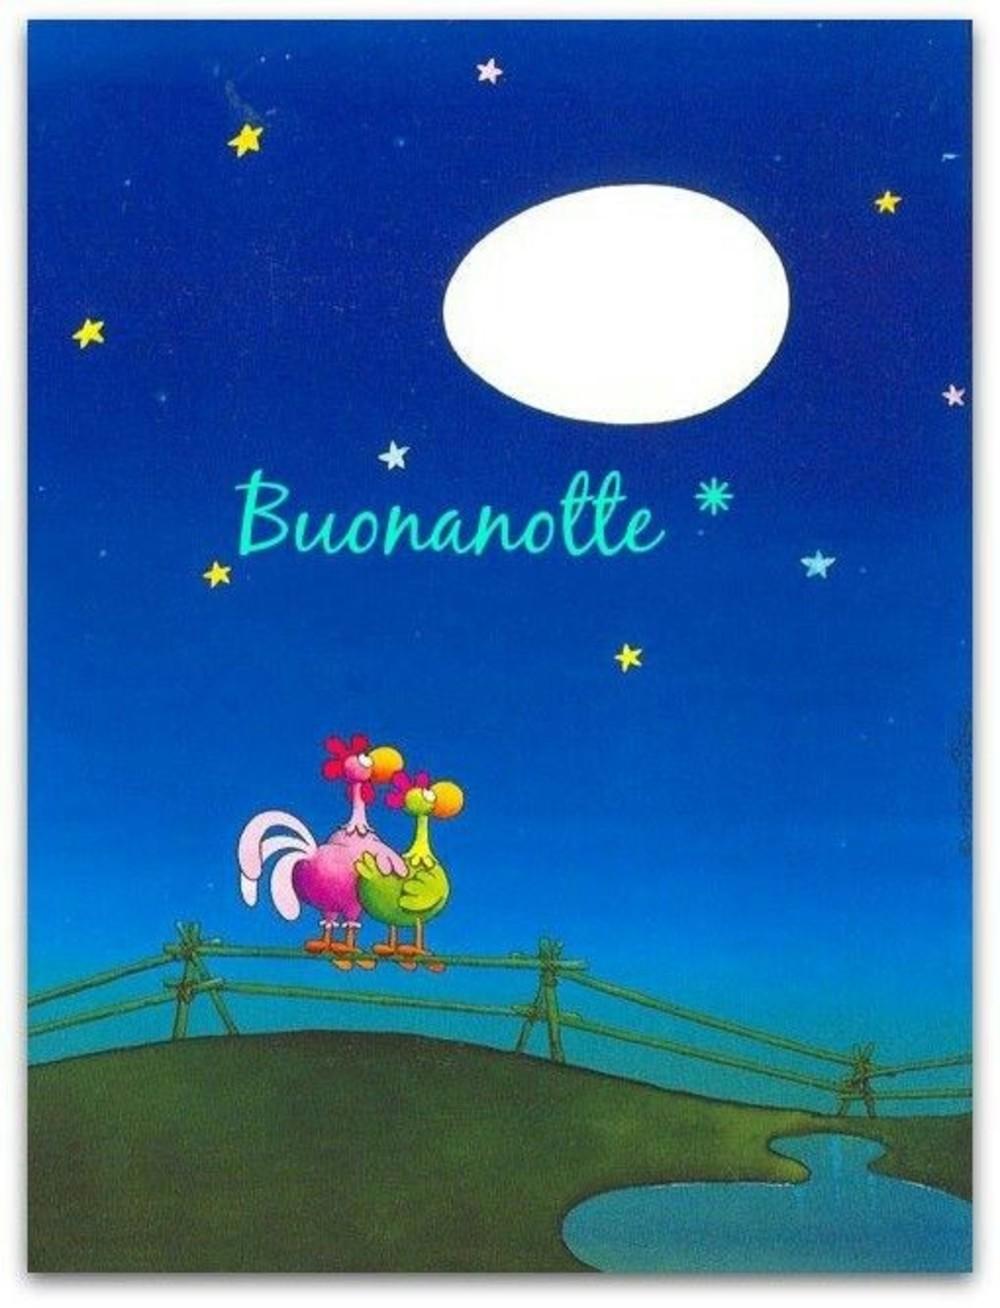 Felice Notte 1133 Immaginifacebook It